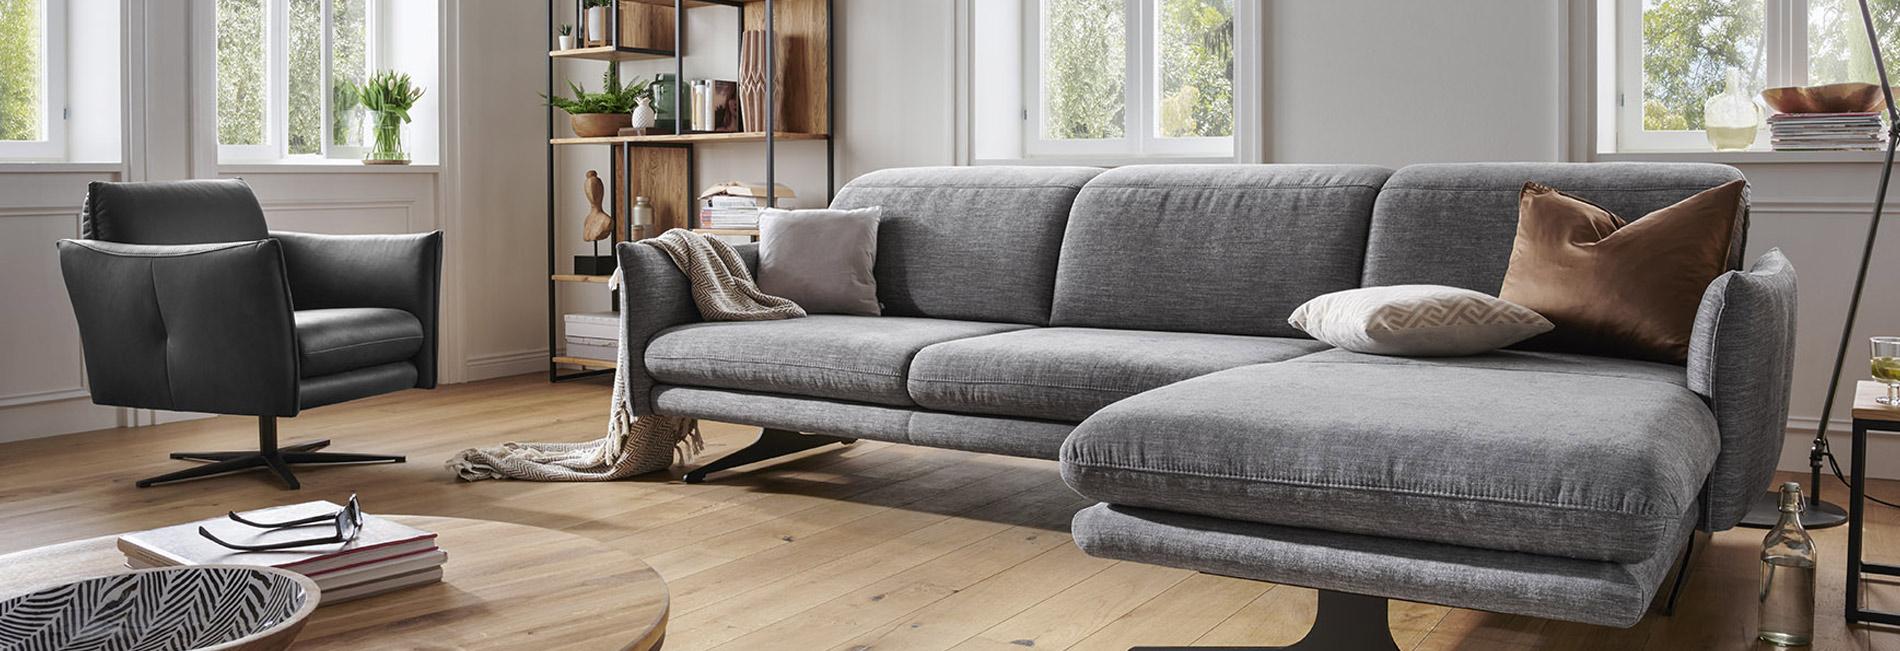 Full Size of Natura Sofa Couch Newport Gebraucht Brooklyn Kansas Love Livingston Massivholz Mbel In Der Berkemeier Home Company Benz Türkische Big Xxl Zweisitzer Antik Sofa Natura Sofa